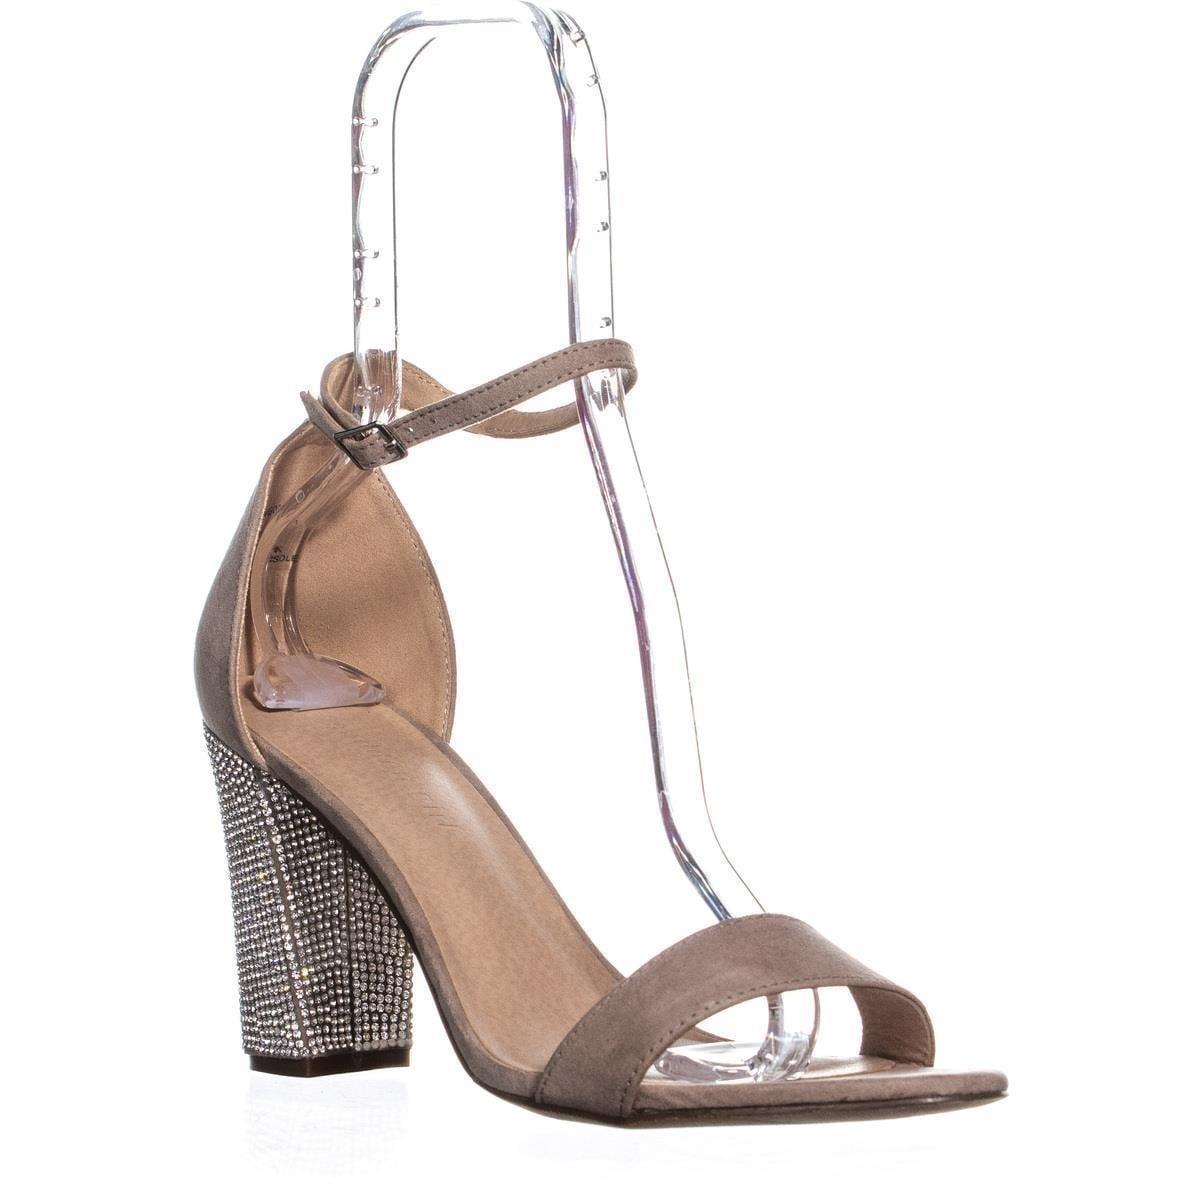 0c11335b327 Shop madden girl Bangg Block Heel Ankle Strap Sandals